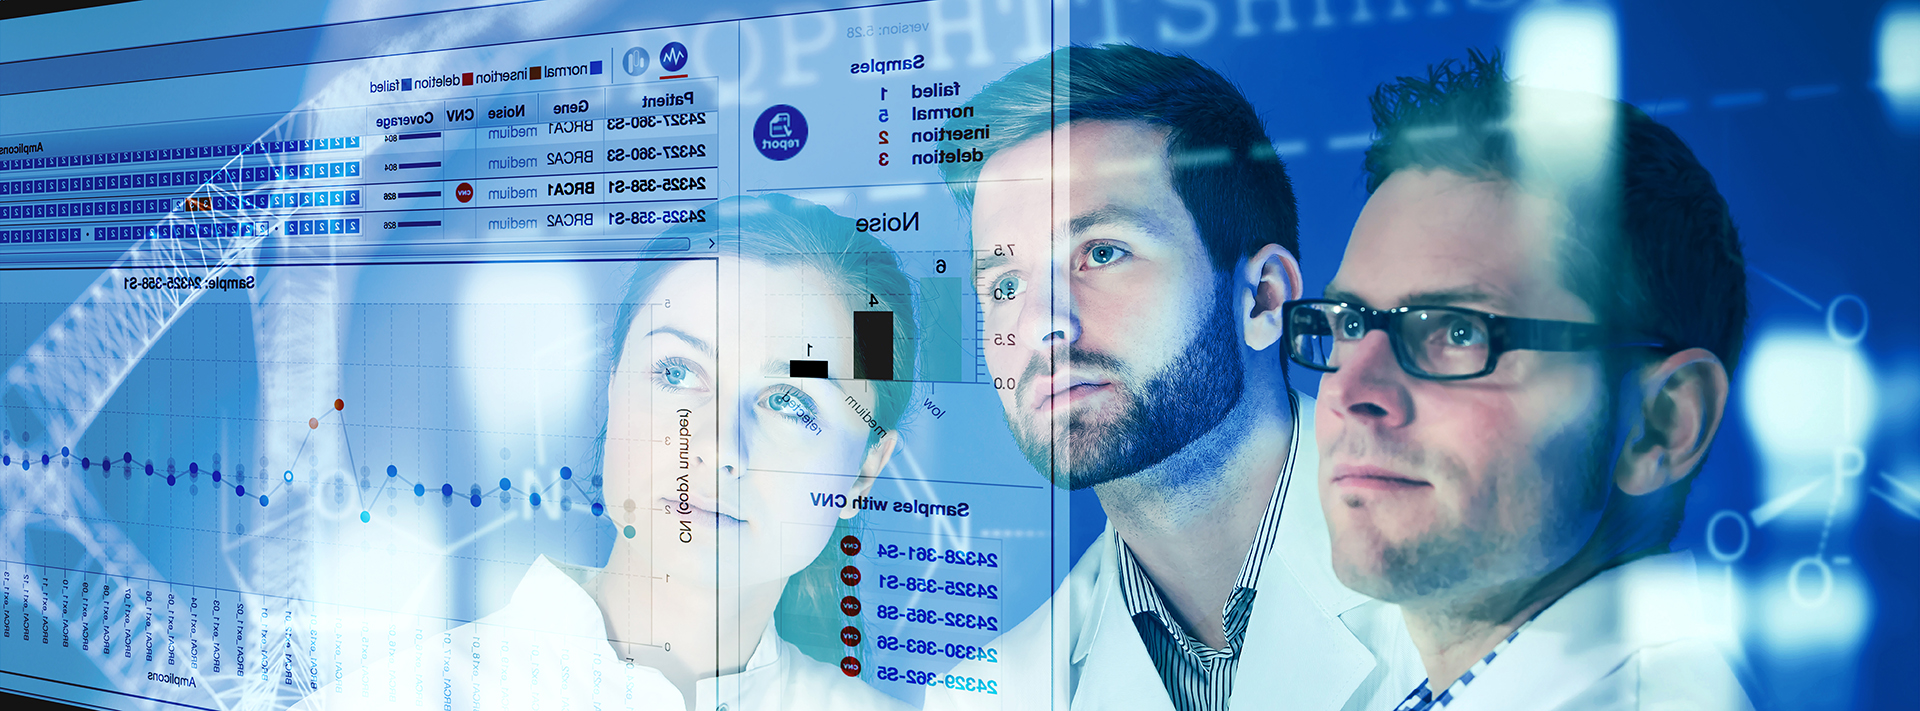 SOPHiA GENETICS raises $77 million to accelerate the democratization of data-driven medicine